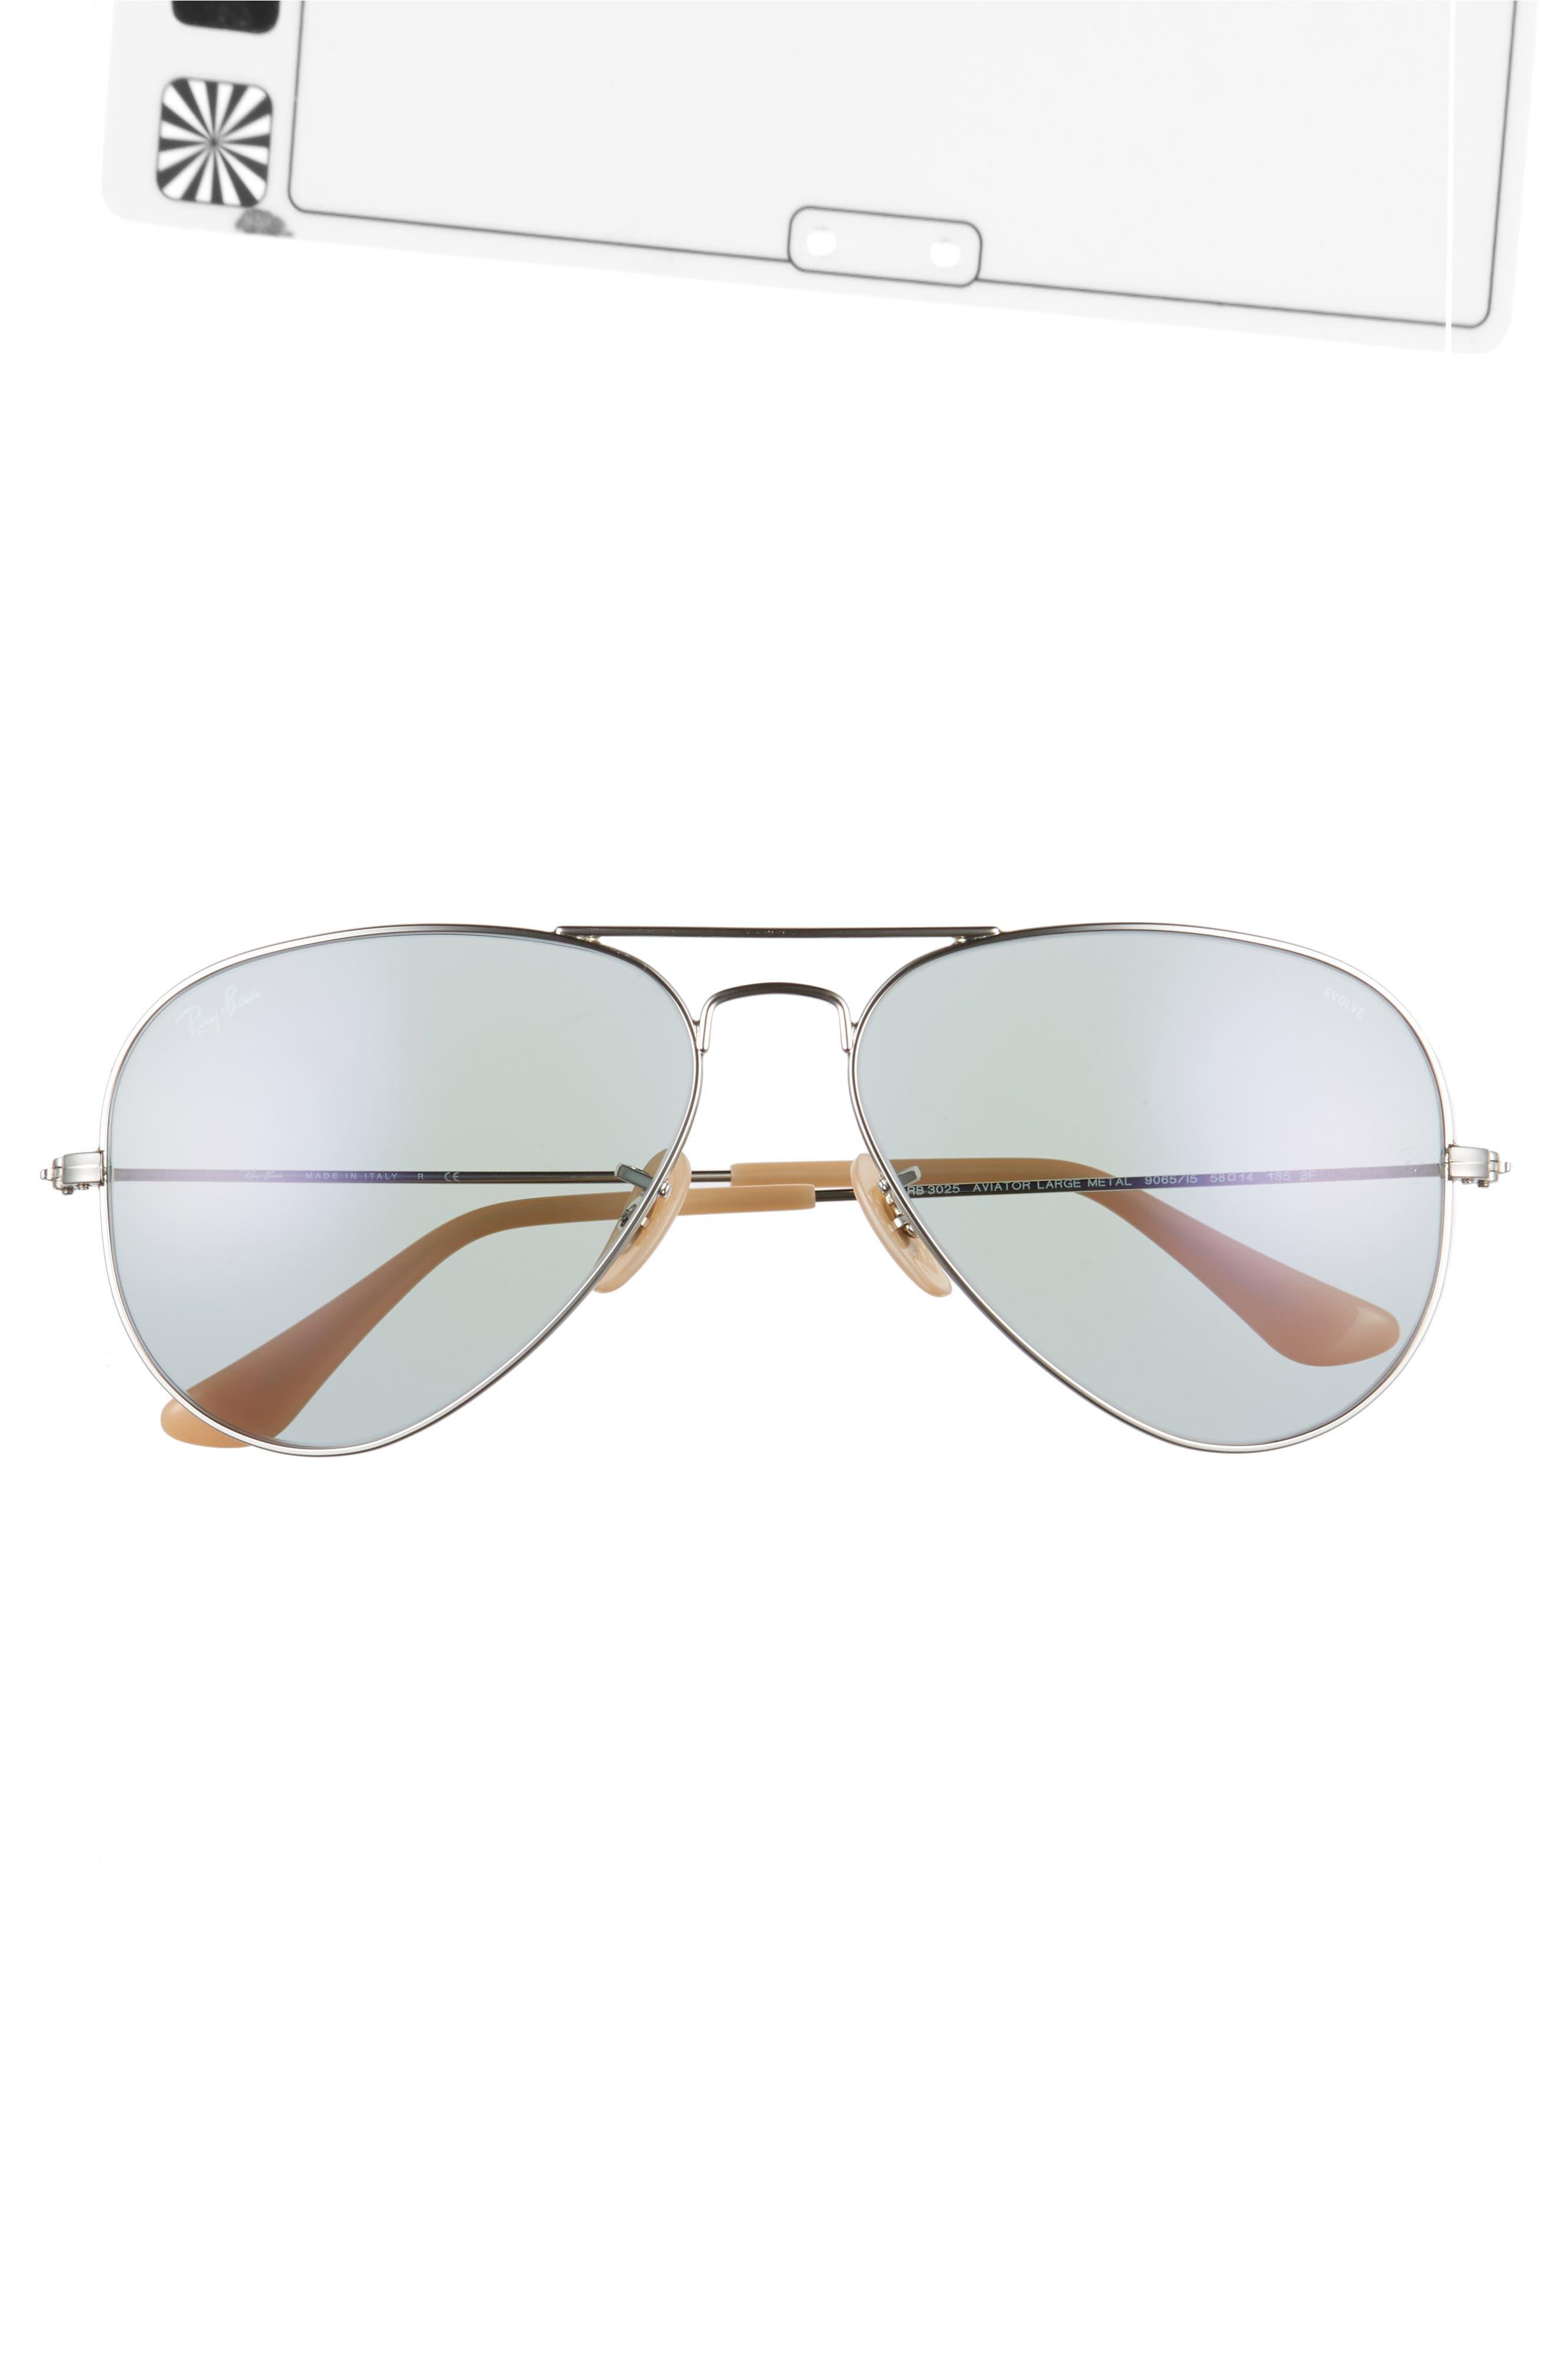 RAY-BAN,                             58mm Photochromic Aviator Sunglasses,                             Alternate thumbnail 3, color,                             040